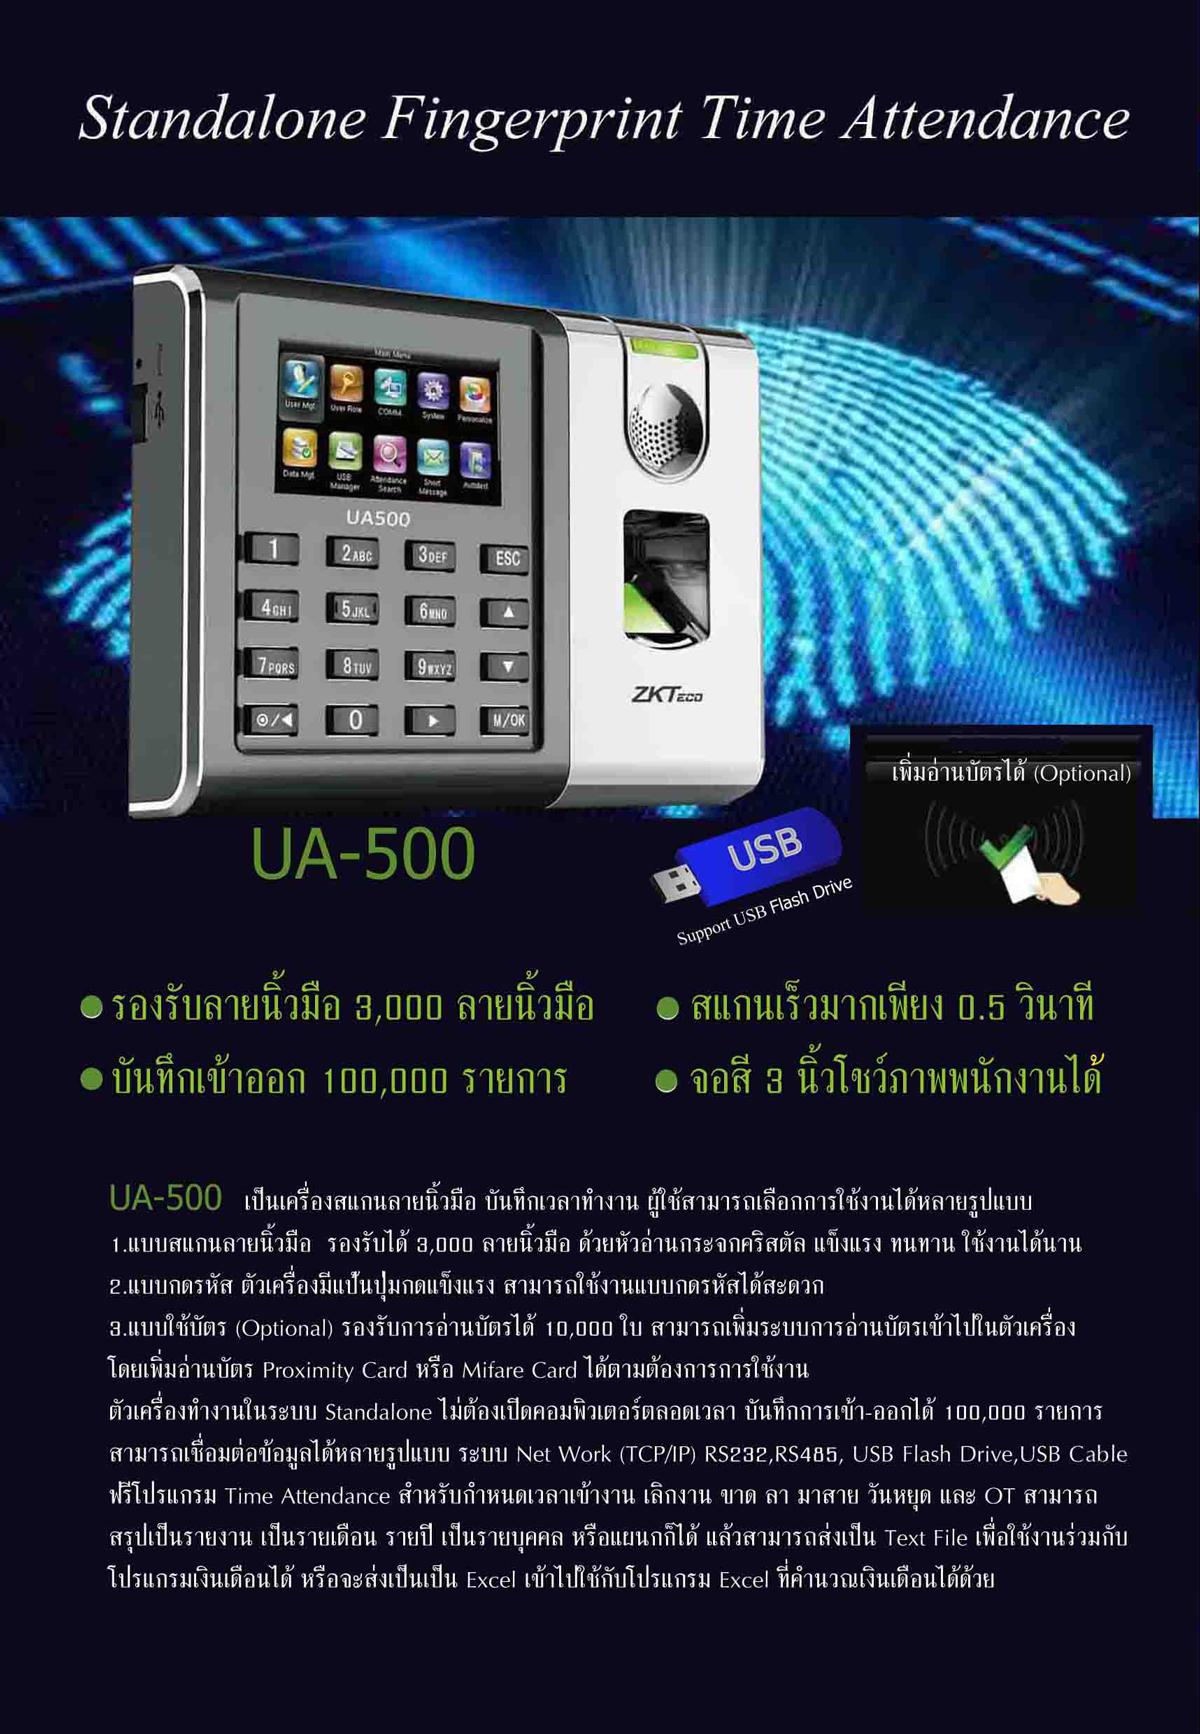 zkteco zksoftware zk ua500 fingerscan fingerprint time attendance